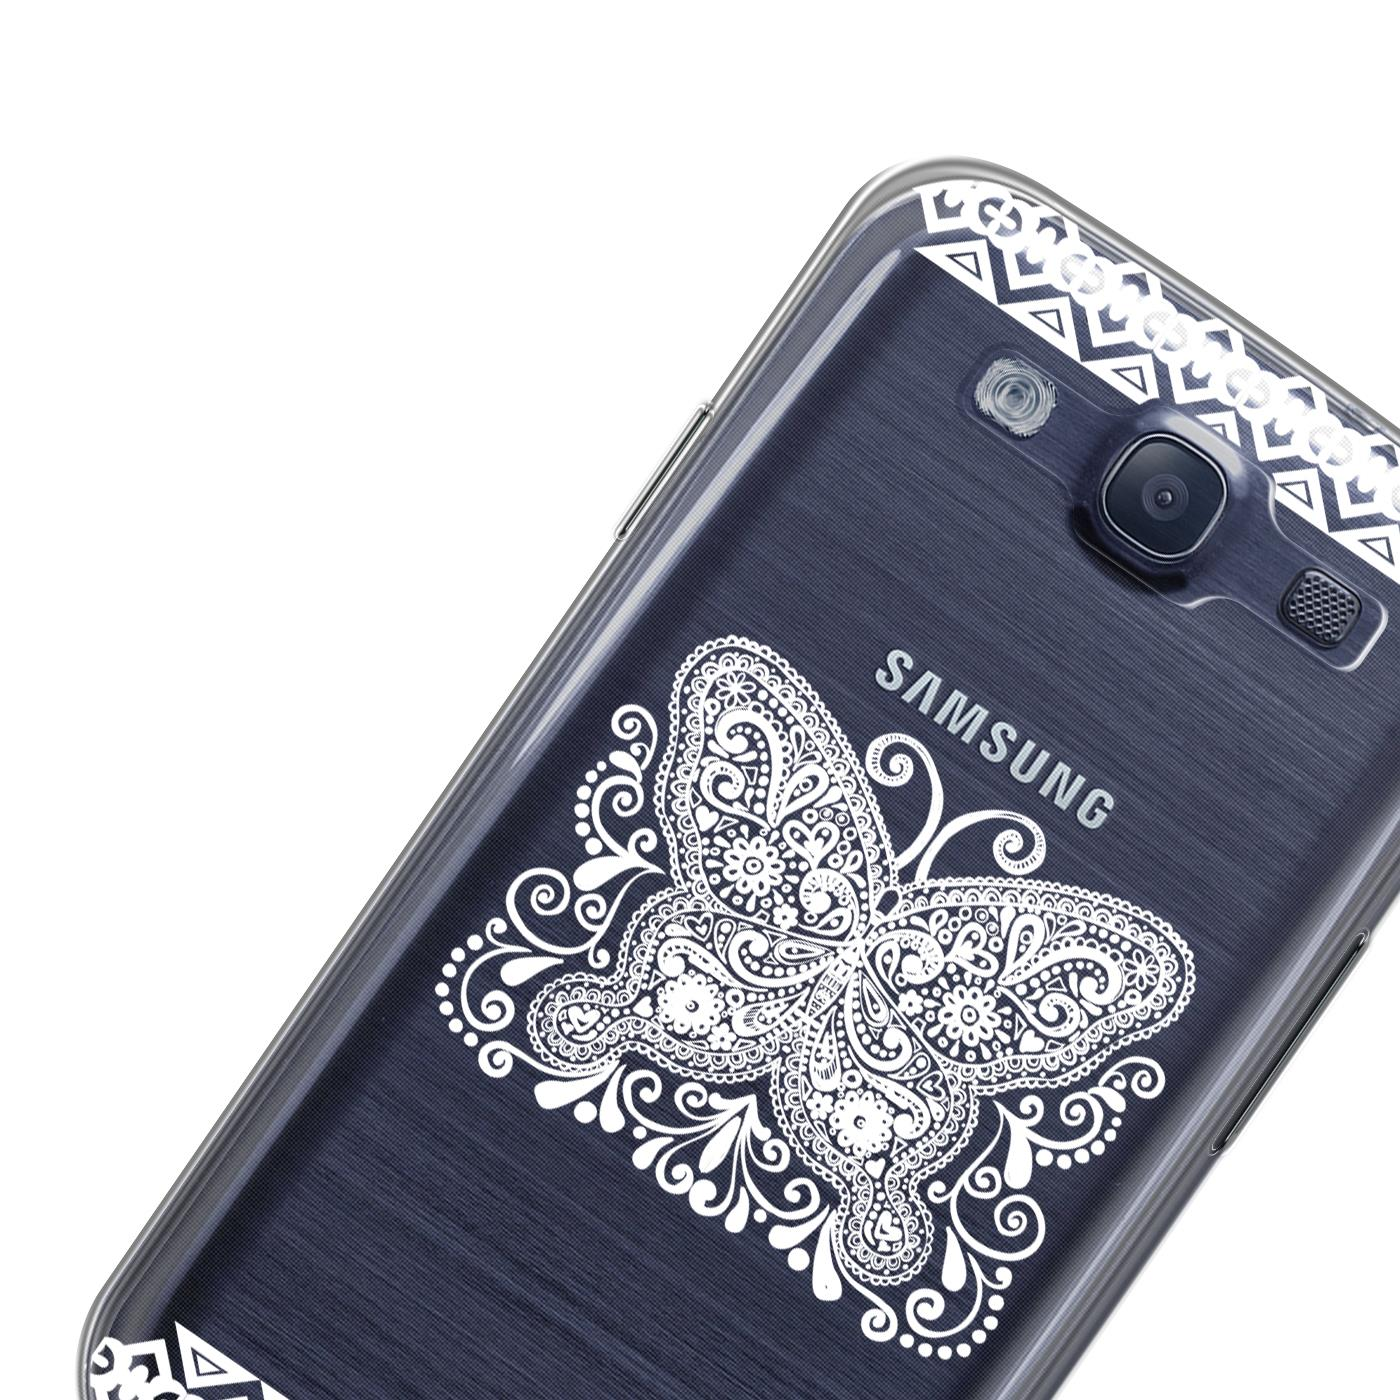 Samsung-Galaxy-S3-Neo-Handy-Schutz-Huelle-Case-TPU-Silikon-Cover-Tasche-Mandala Indexbild 6